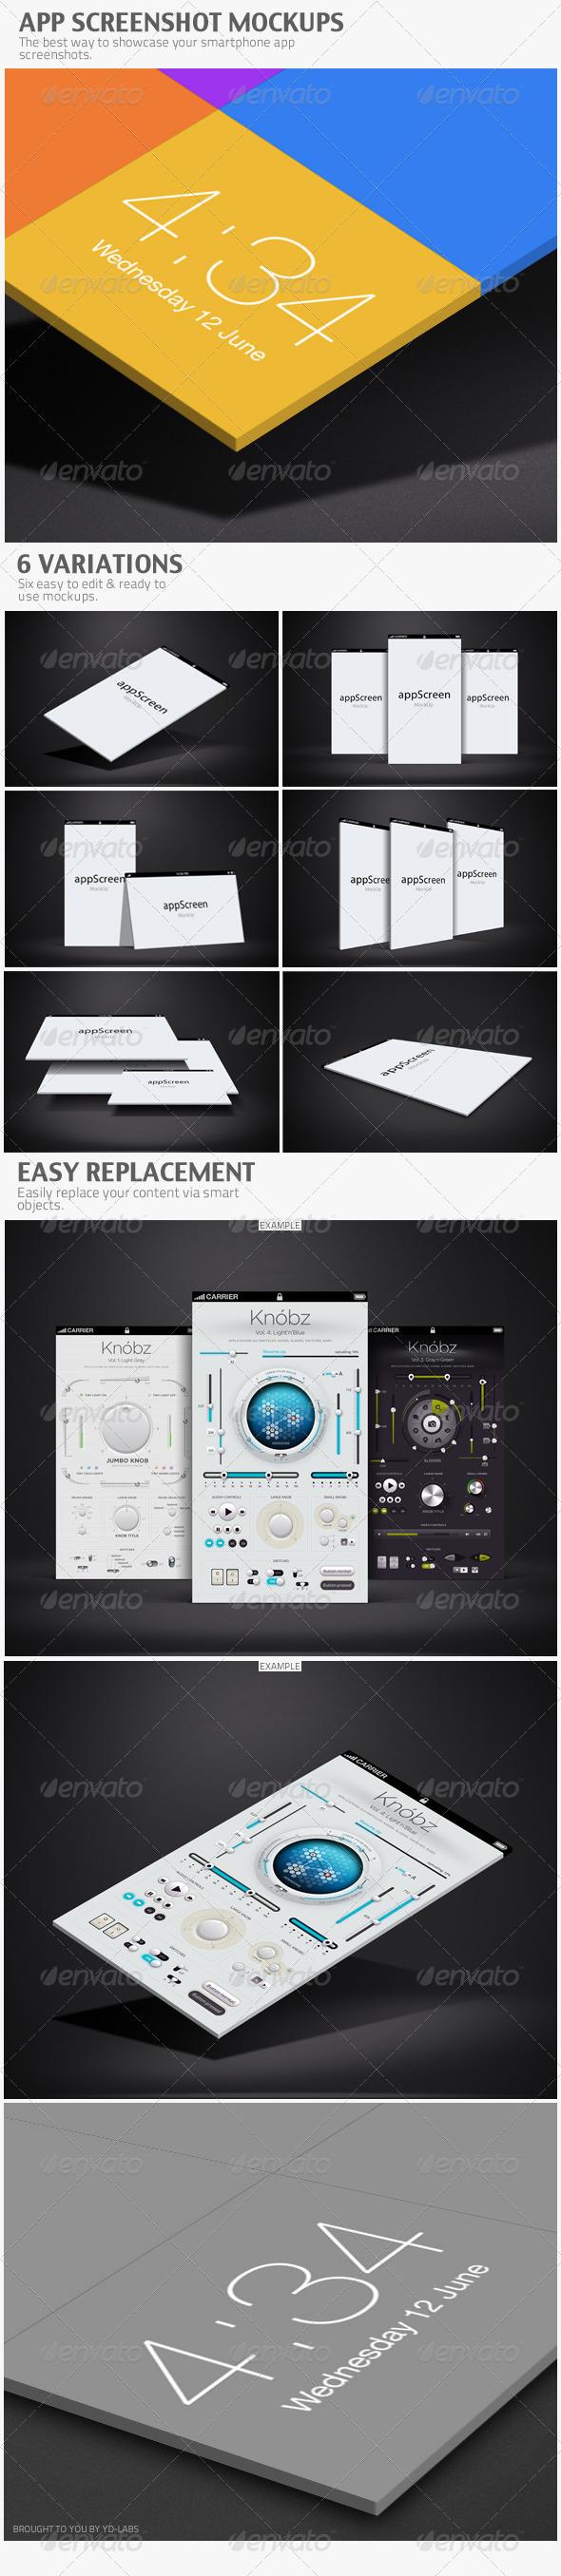 GraphicRiver App Screenshot Mockups 5177312